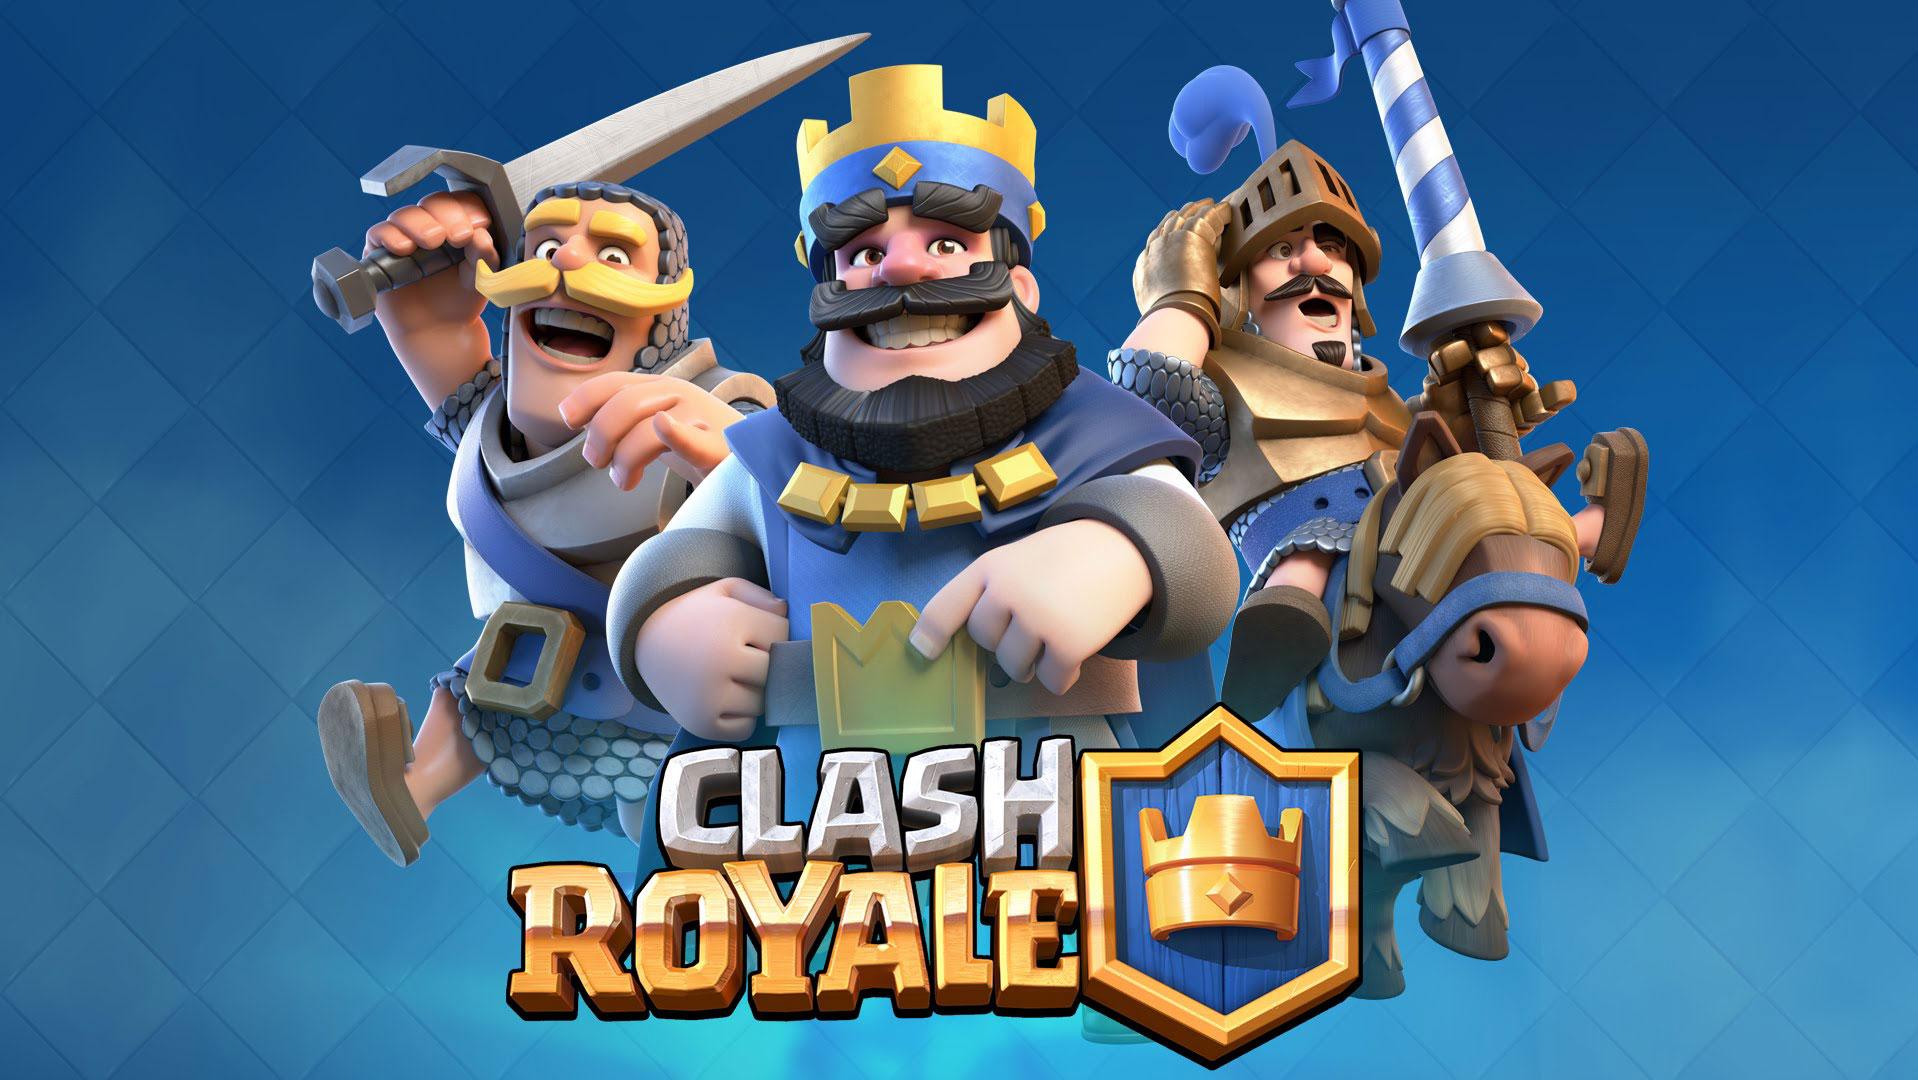 Free clash royale phone wallpaper by ash_ketchump